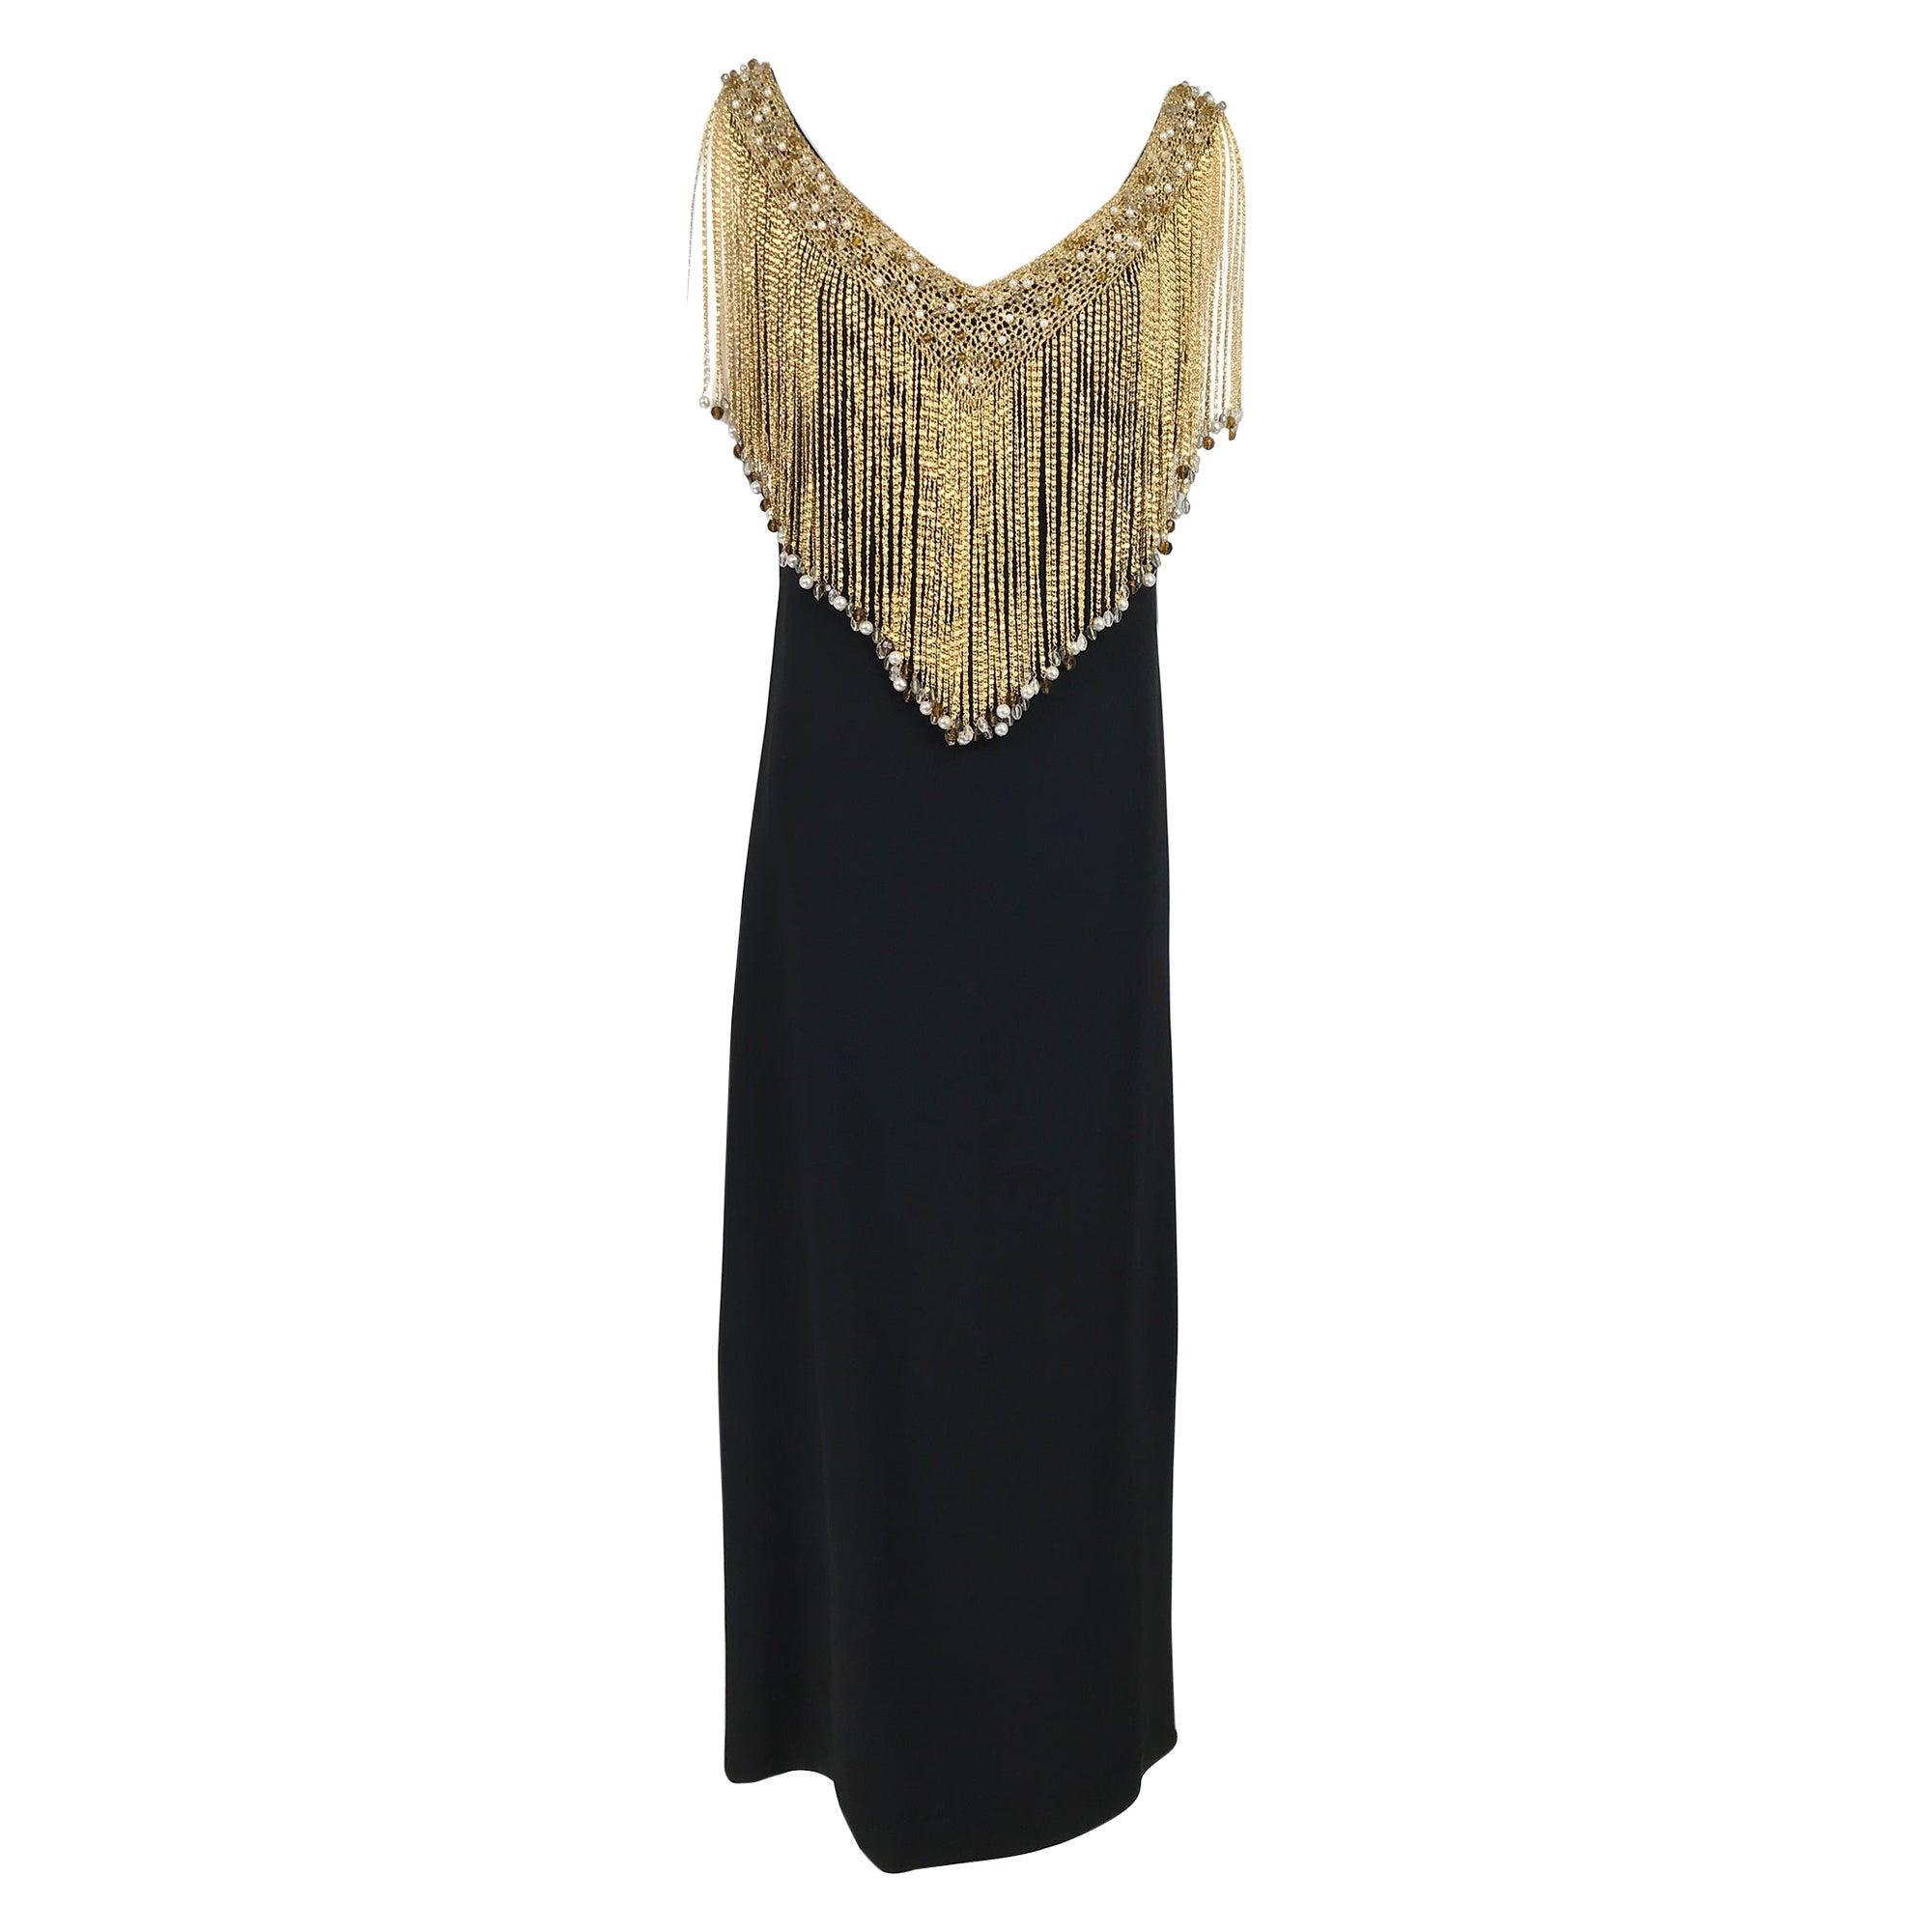 Loris Azzaro Couture Gold Chain Fringe Collar Black Maxi Dress 1970s